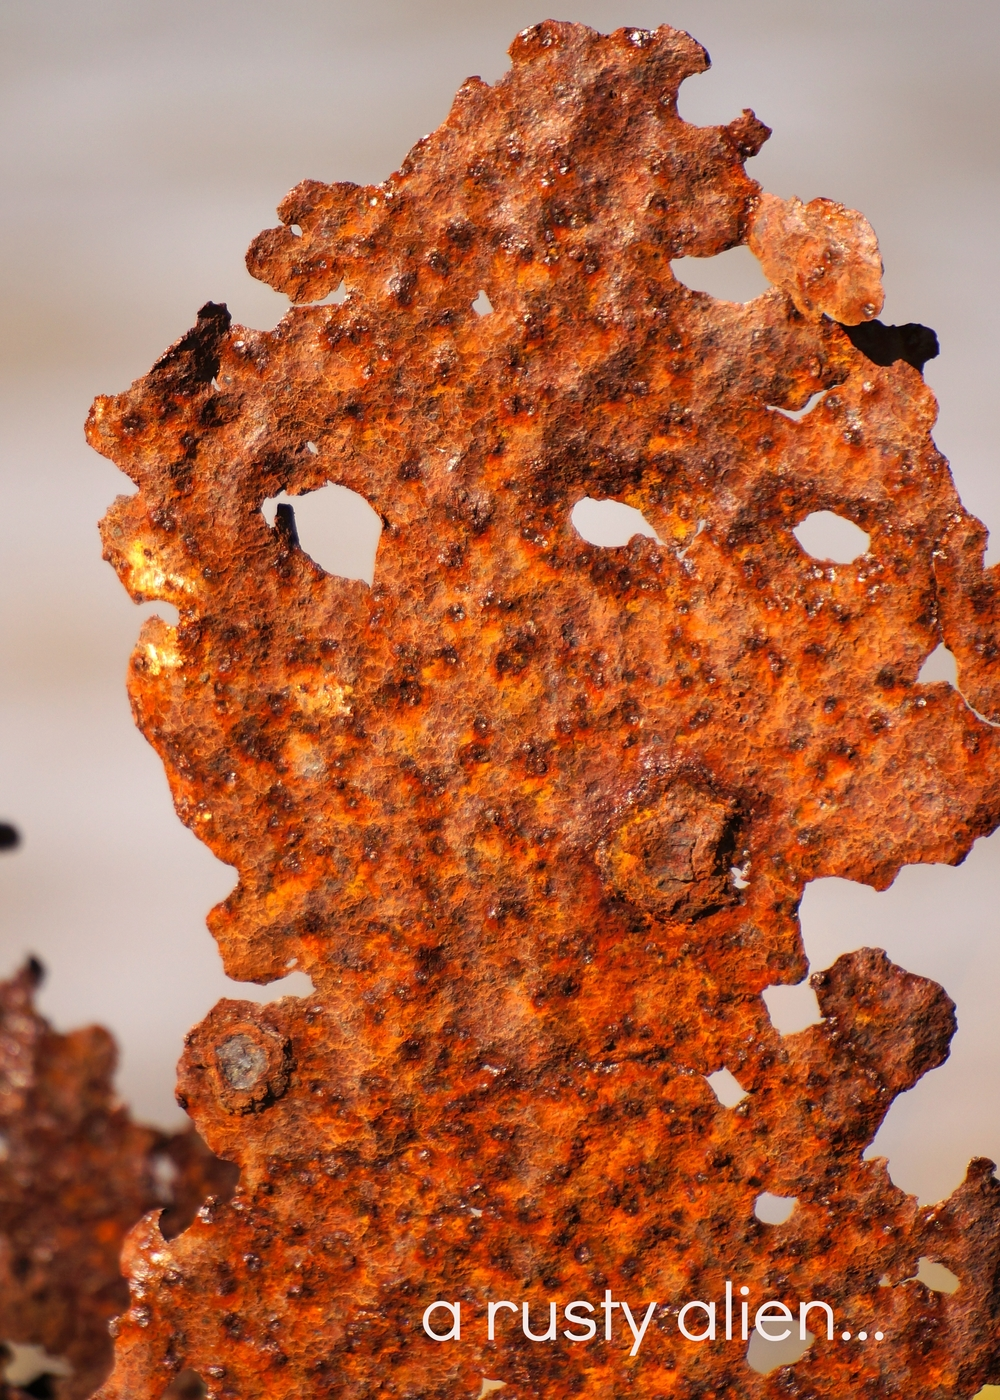 SP-Rust1.jpg